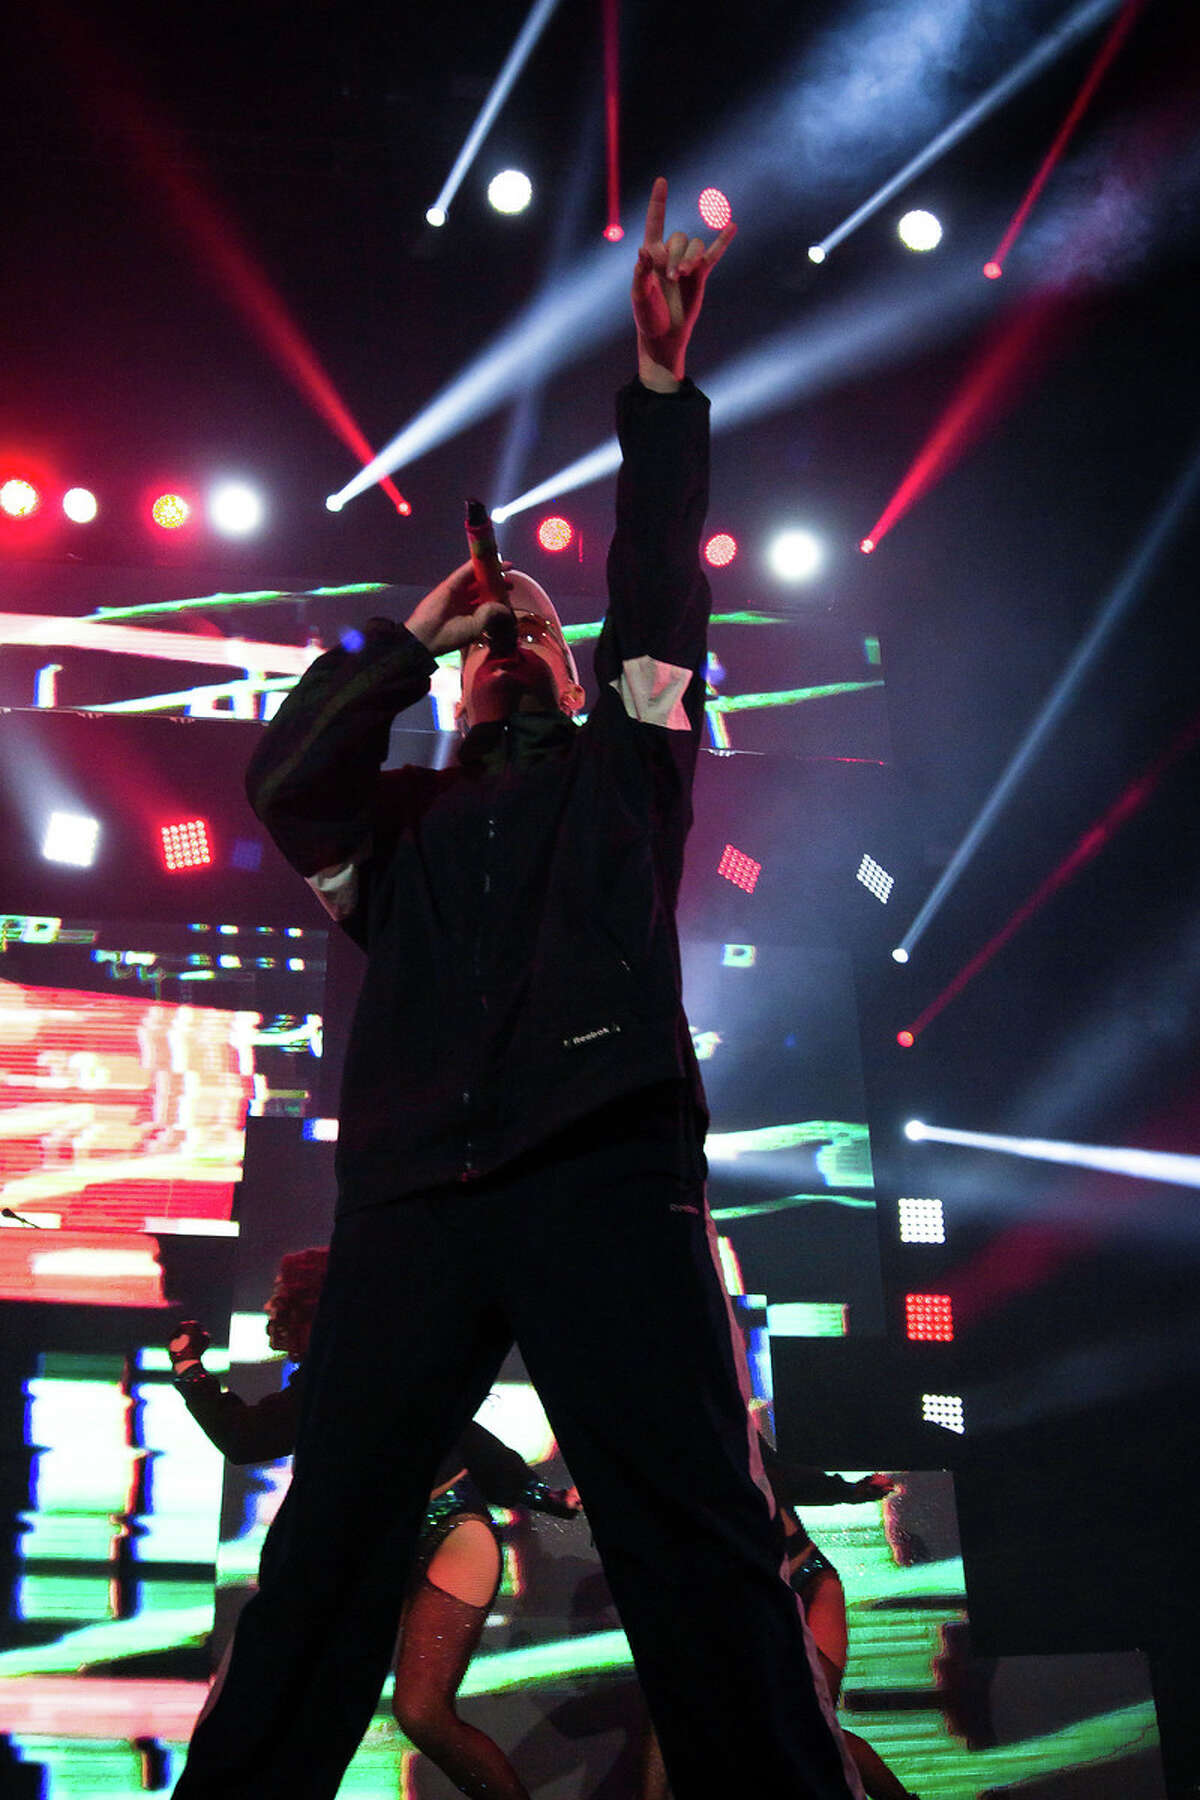 Latin trap and reggaeton artist, Bad Bunny, put on wild show at the Laredo Energy Arena on Sunday.